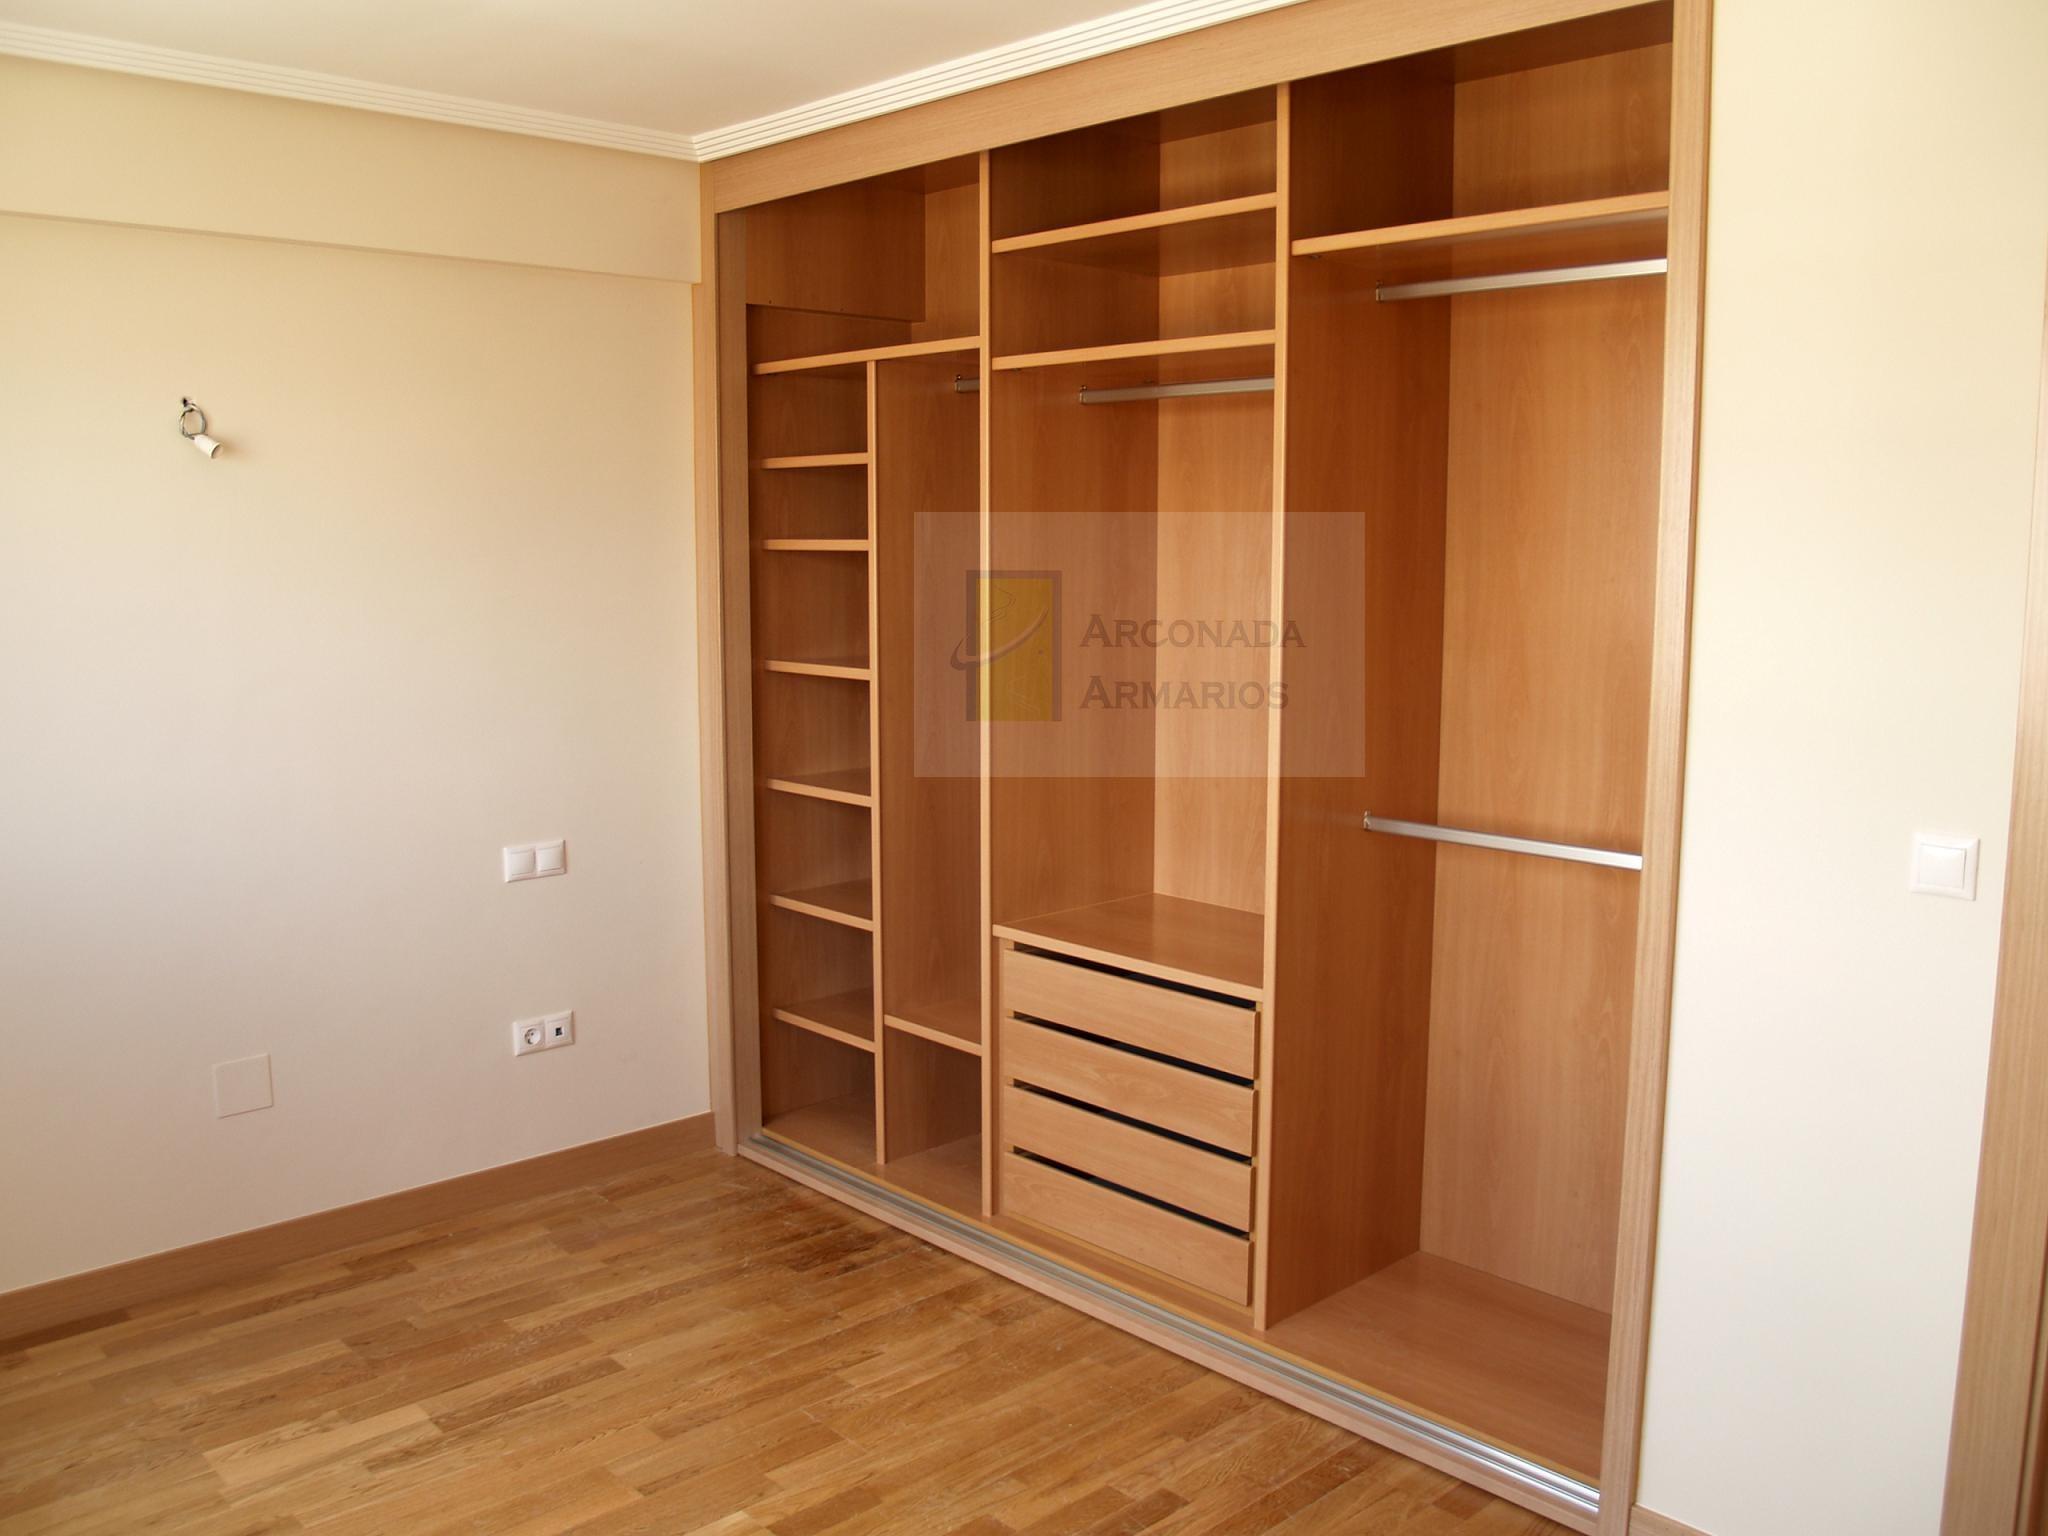 Interiores armarios empotrados 13764 armarios ideas for Armarios empotrados